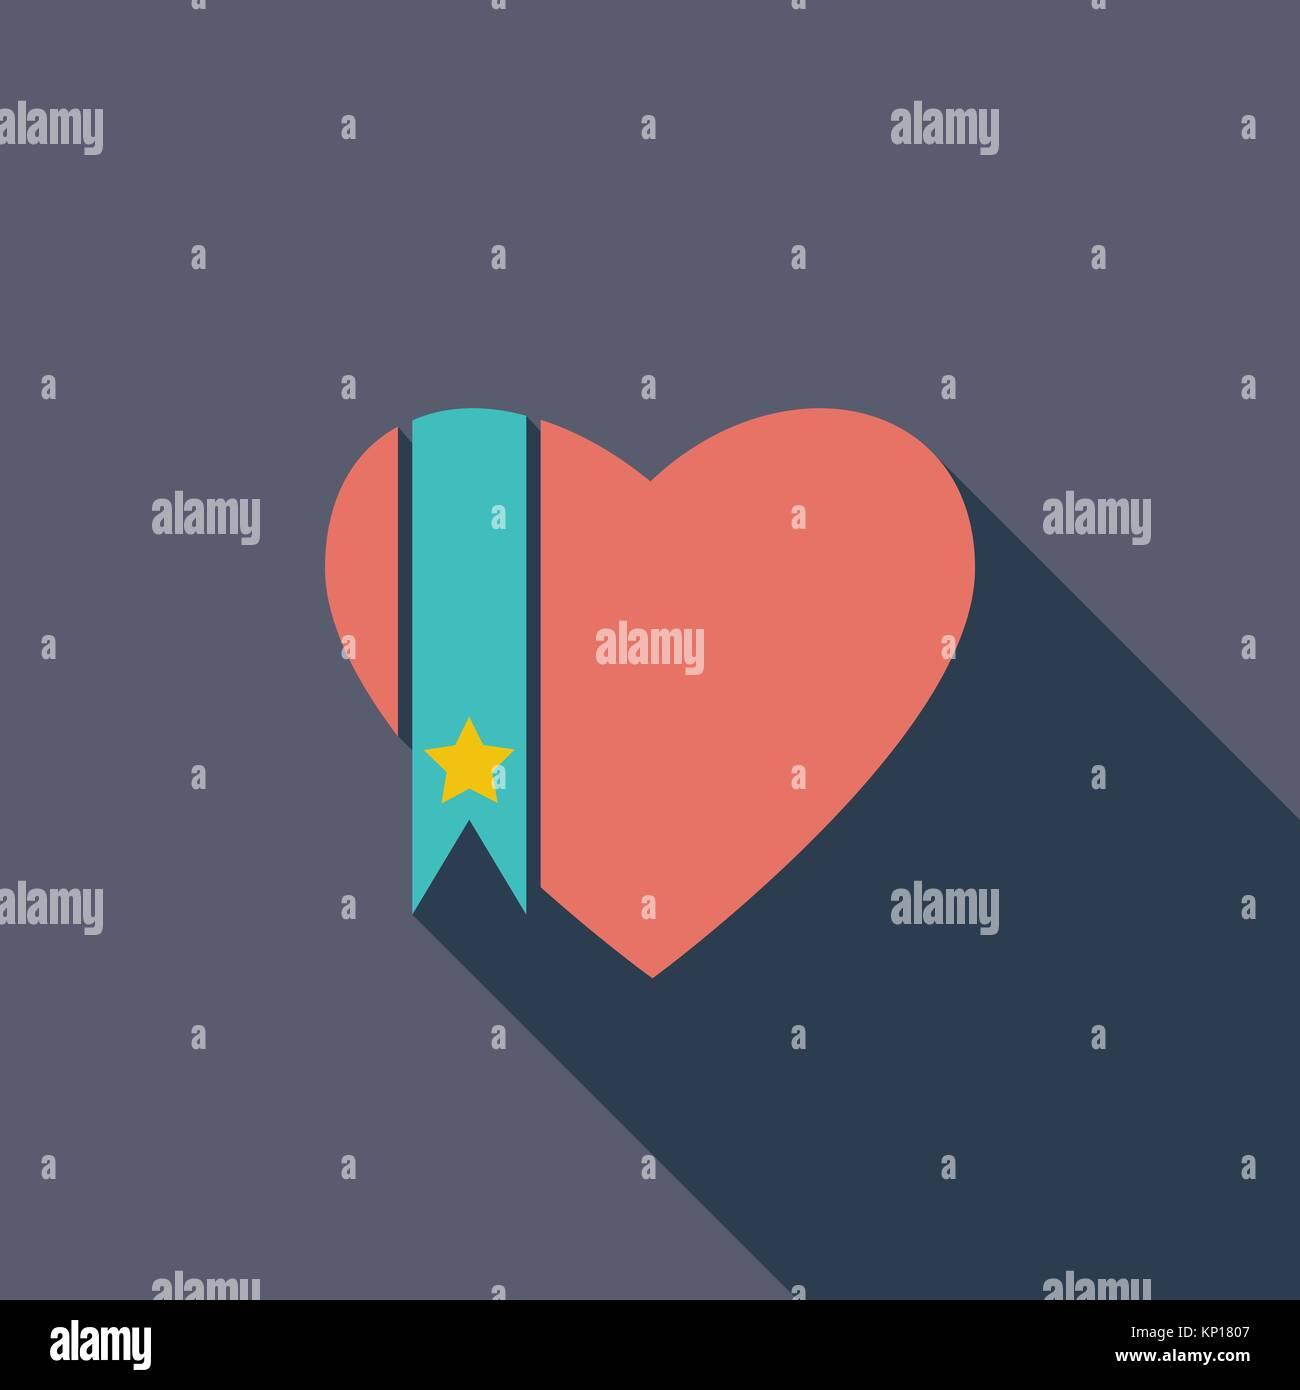 Heart icon - Stock Image